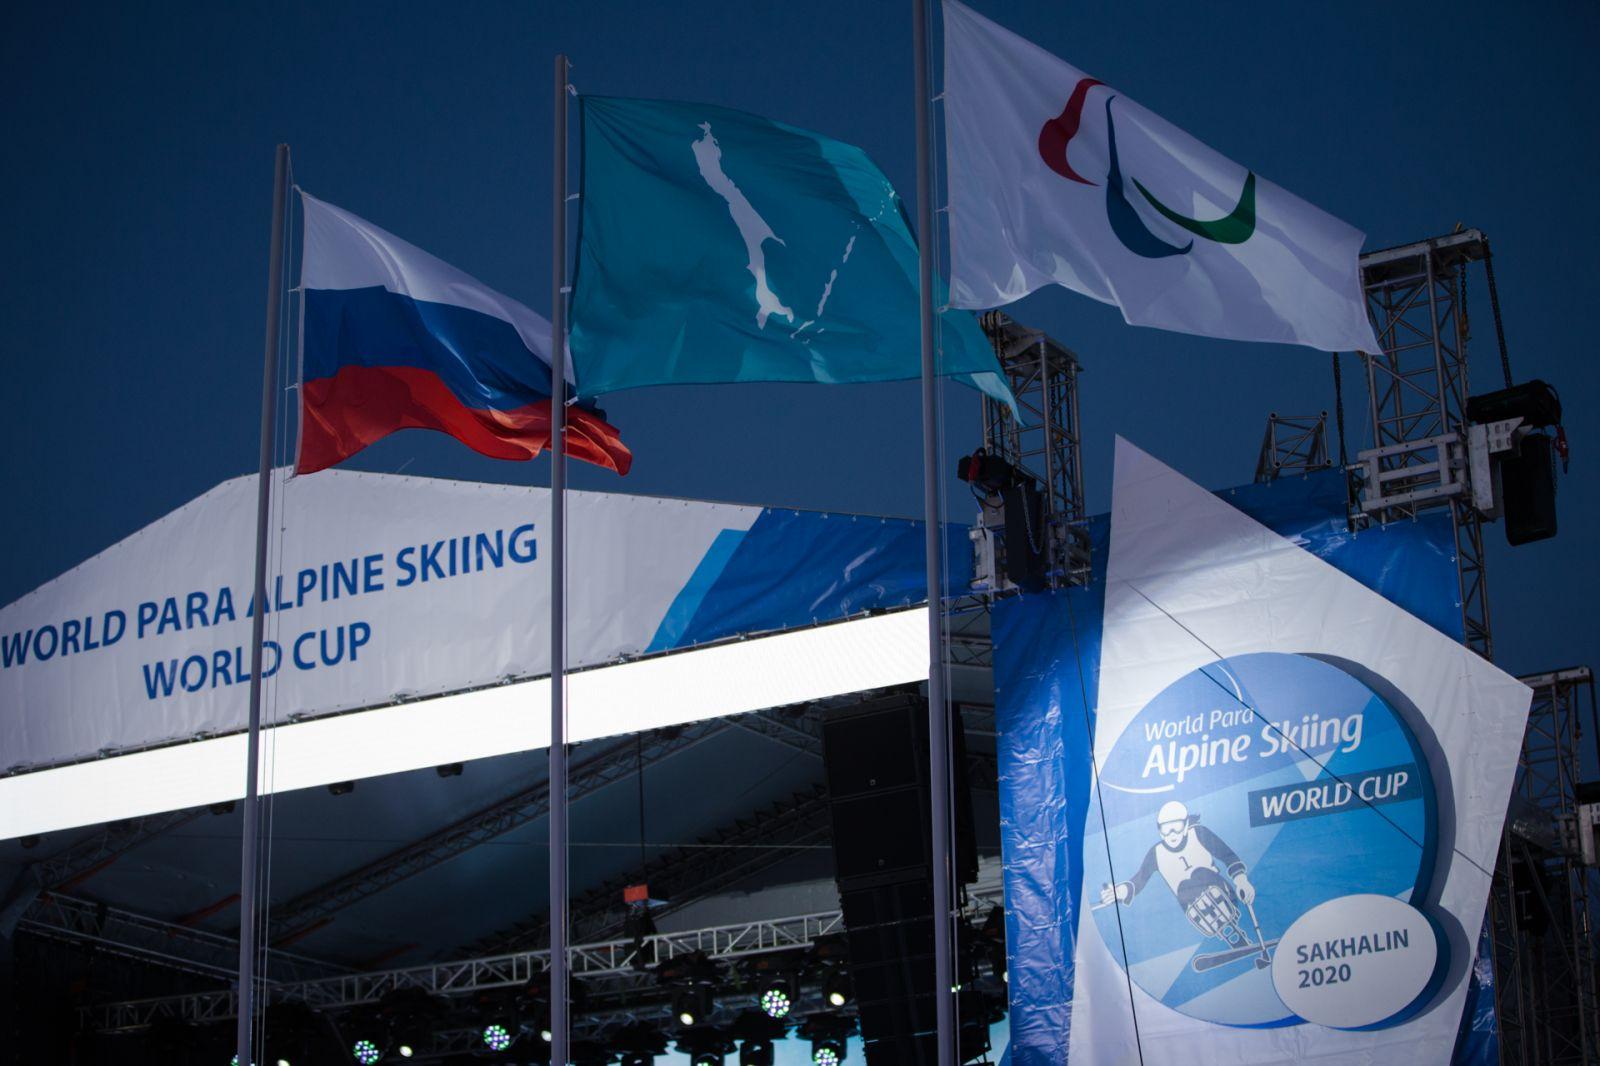 А.А. Строкин в г. Южно-Сахалинске принял участие в церемонии открытия 4-го этапа Кубка мира по горнолыжному спорту МПК